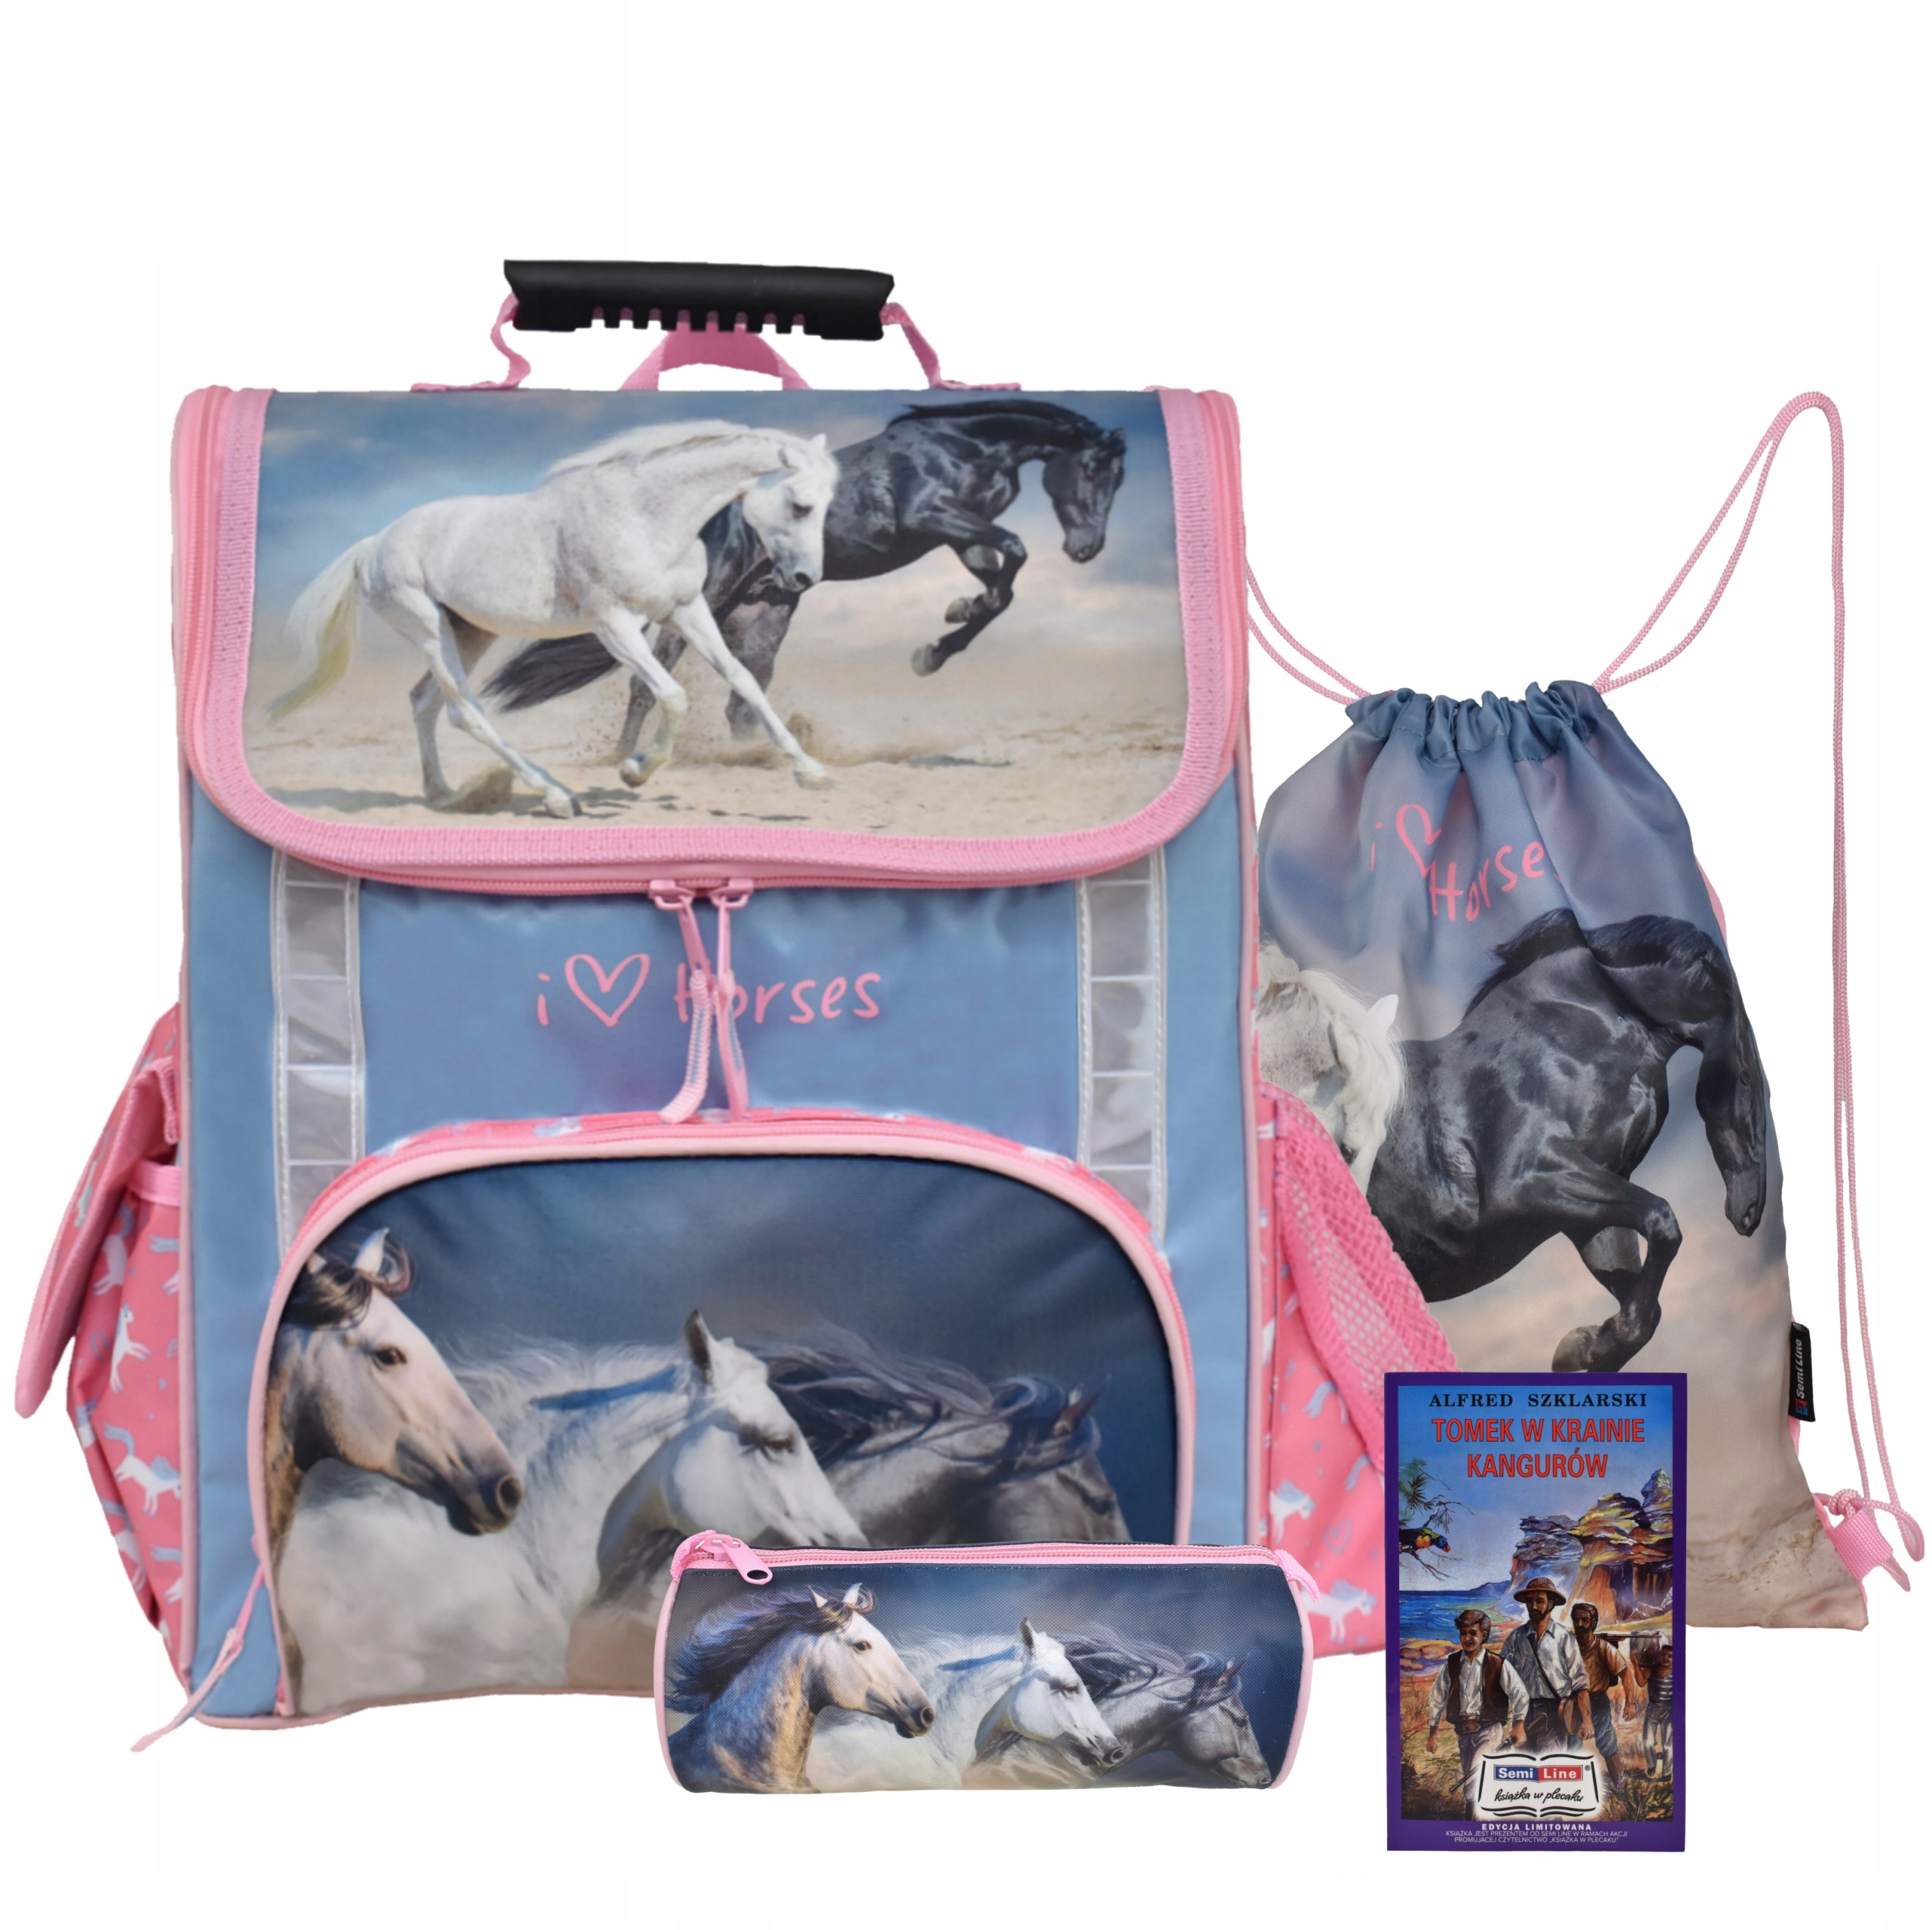 TORNISTER, футляр для карандашей, сумка - набор розового цвета